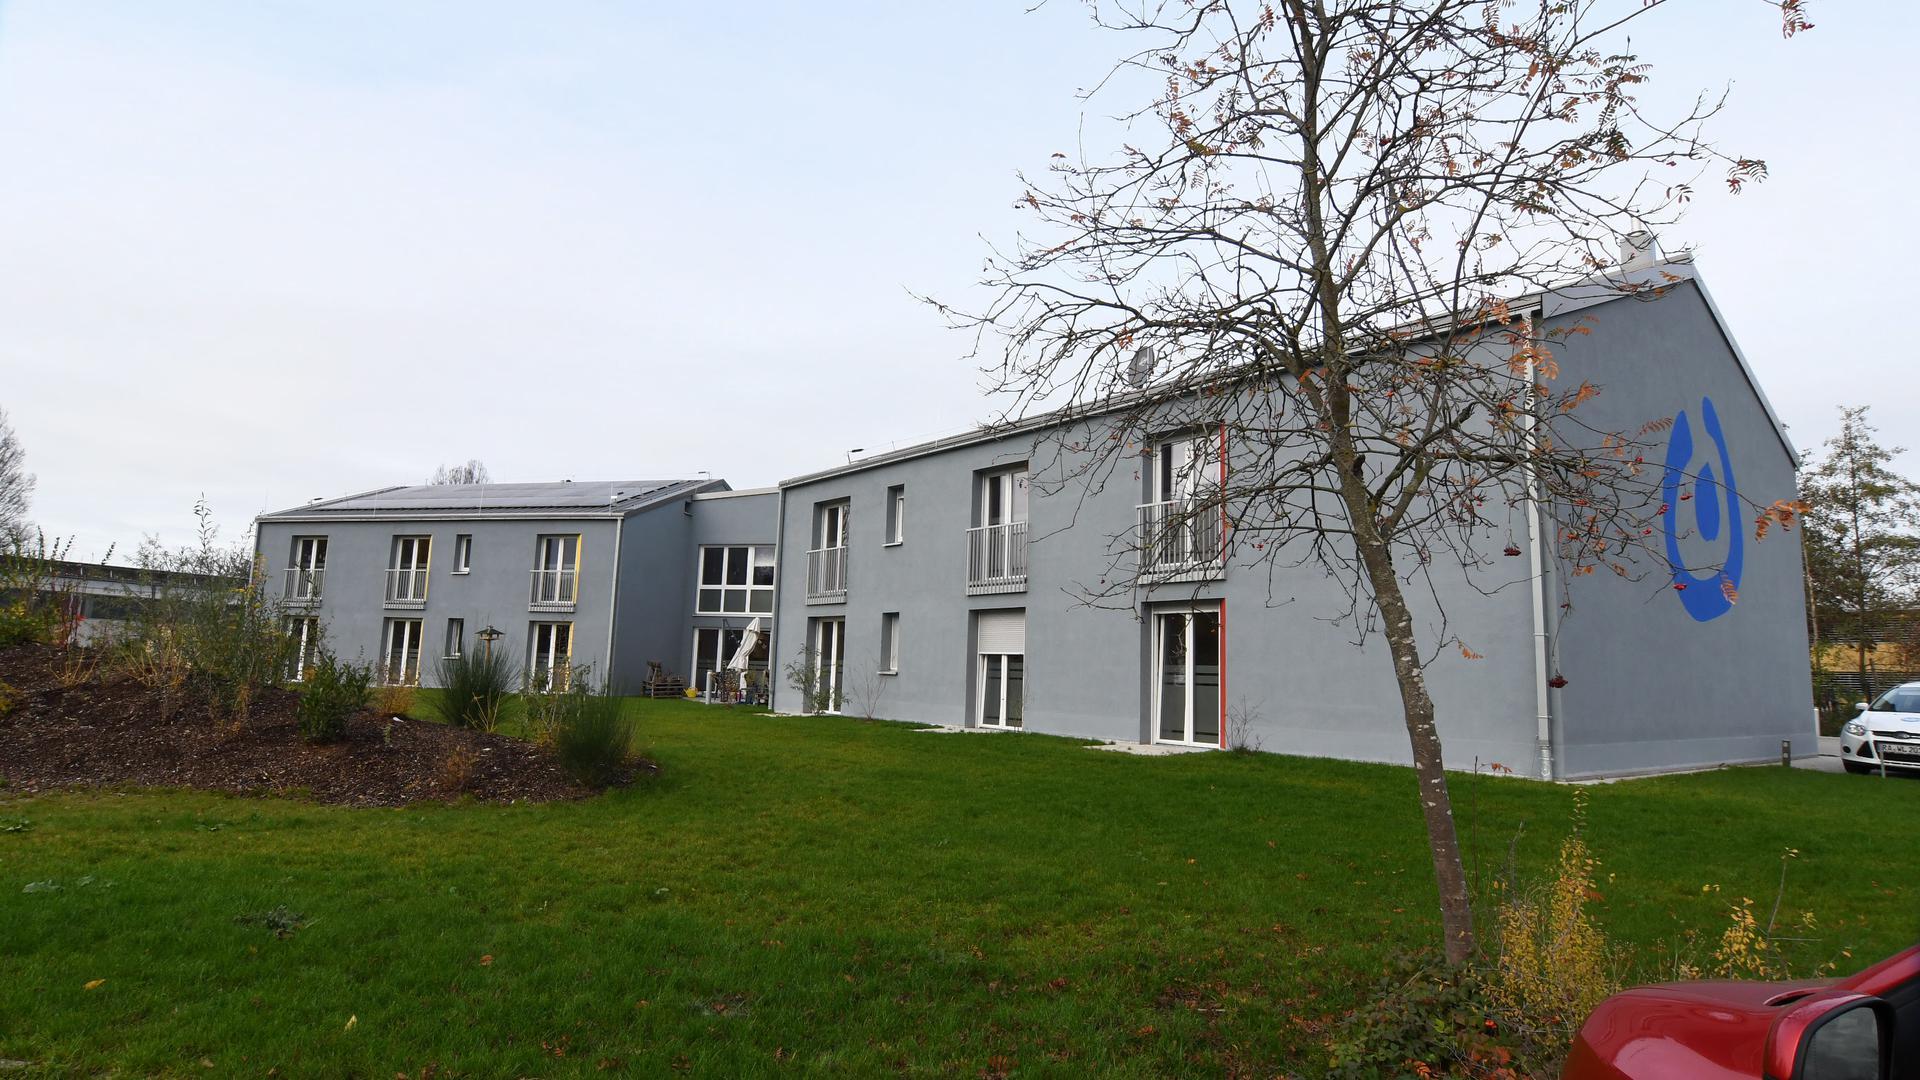 Lebenshilfe Wohnstätte Bühl Leopoldstr. 4